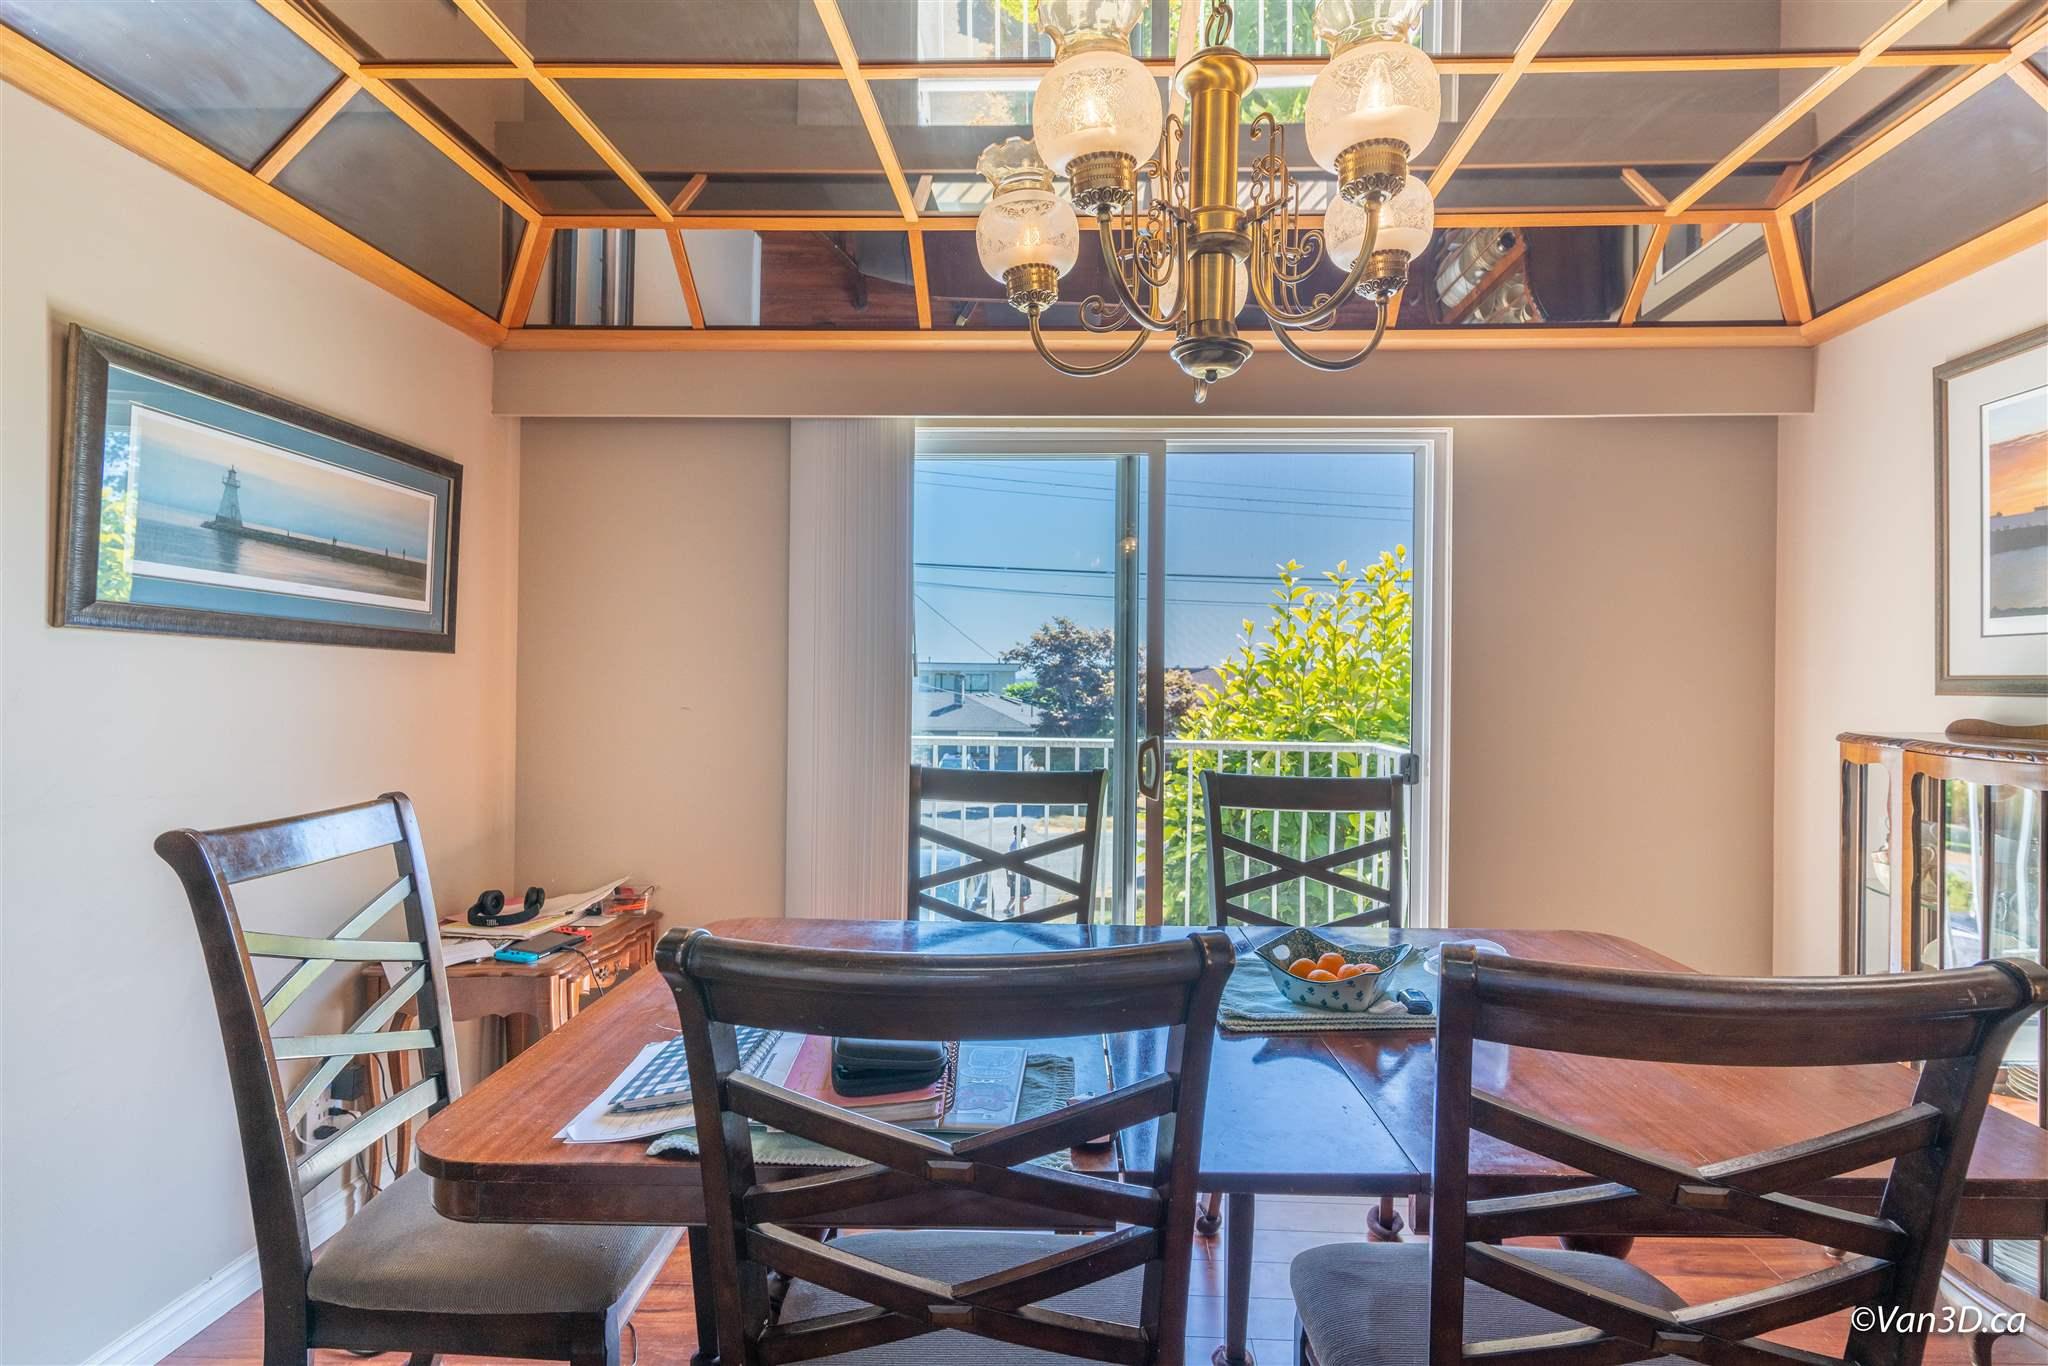 14495 MANN PARK CRESCENT - White Rock House/Single Family for sale, 4 Bedrooms (R2604561) - #21